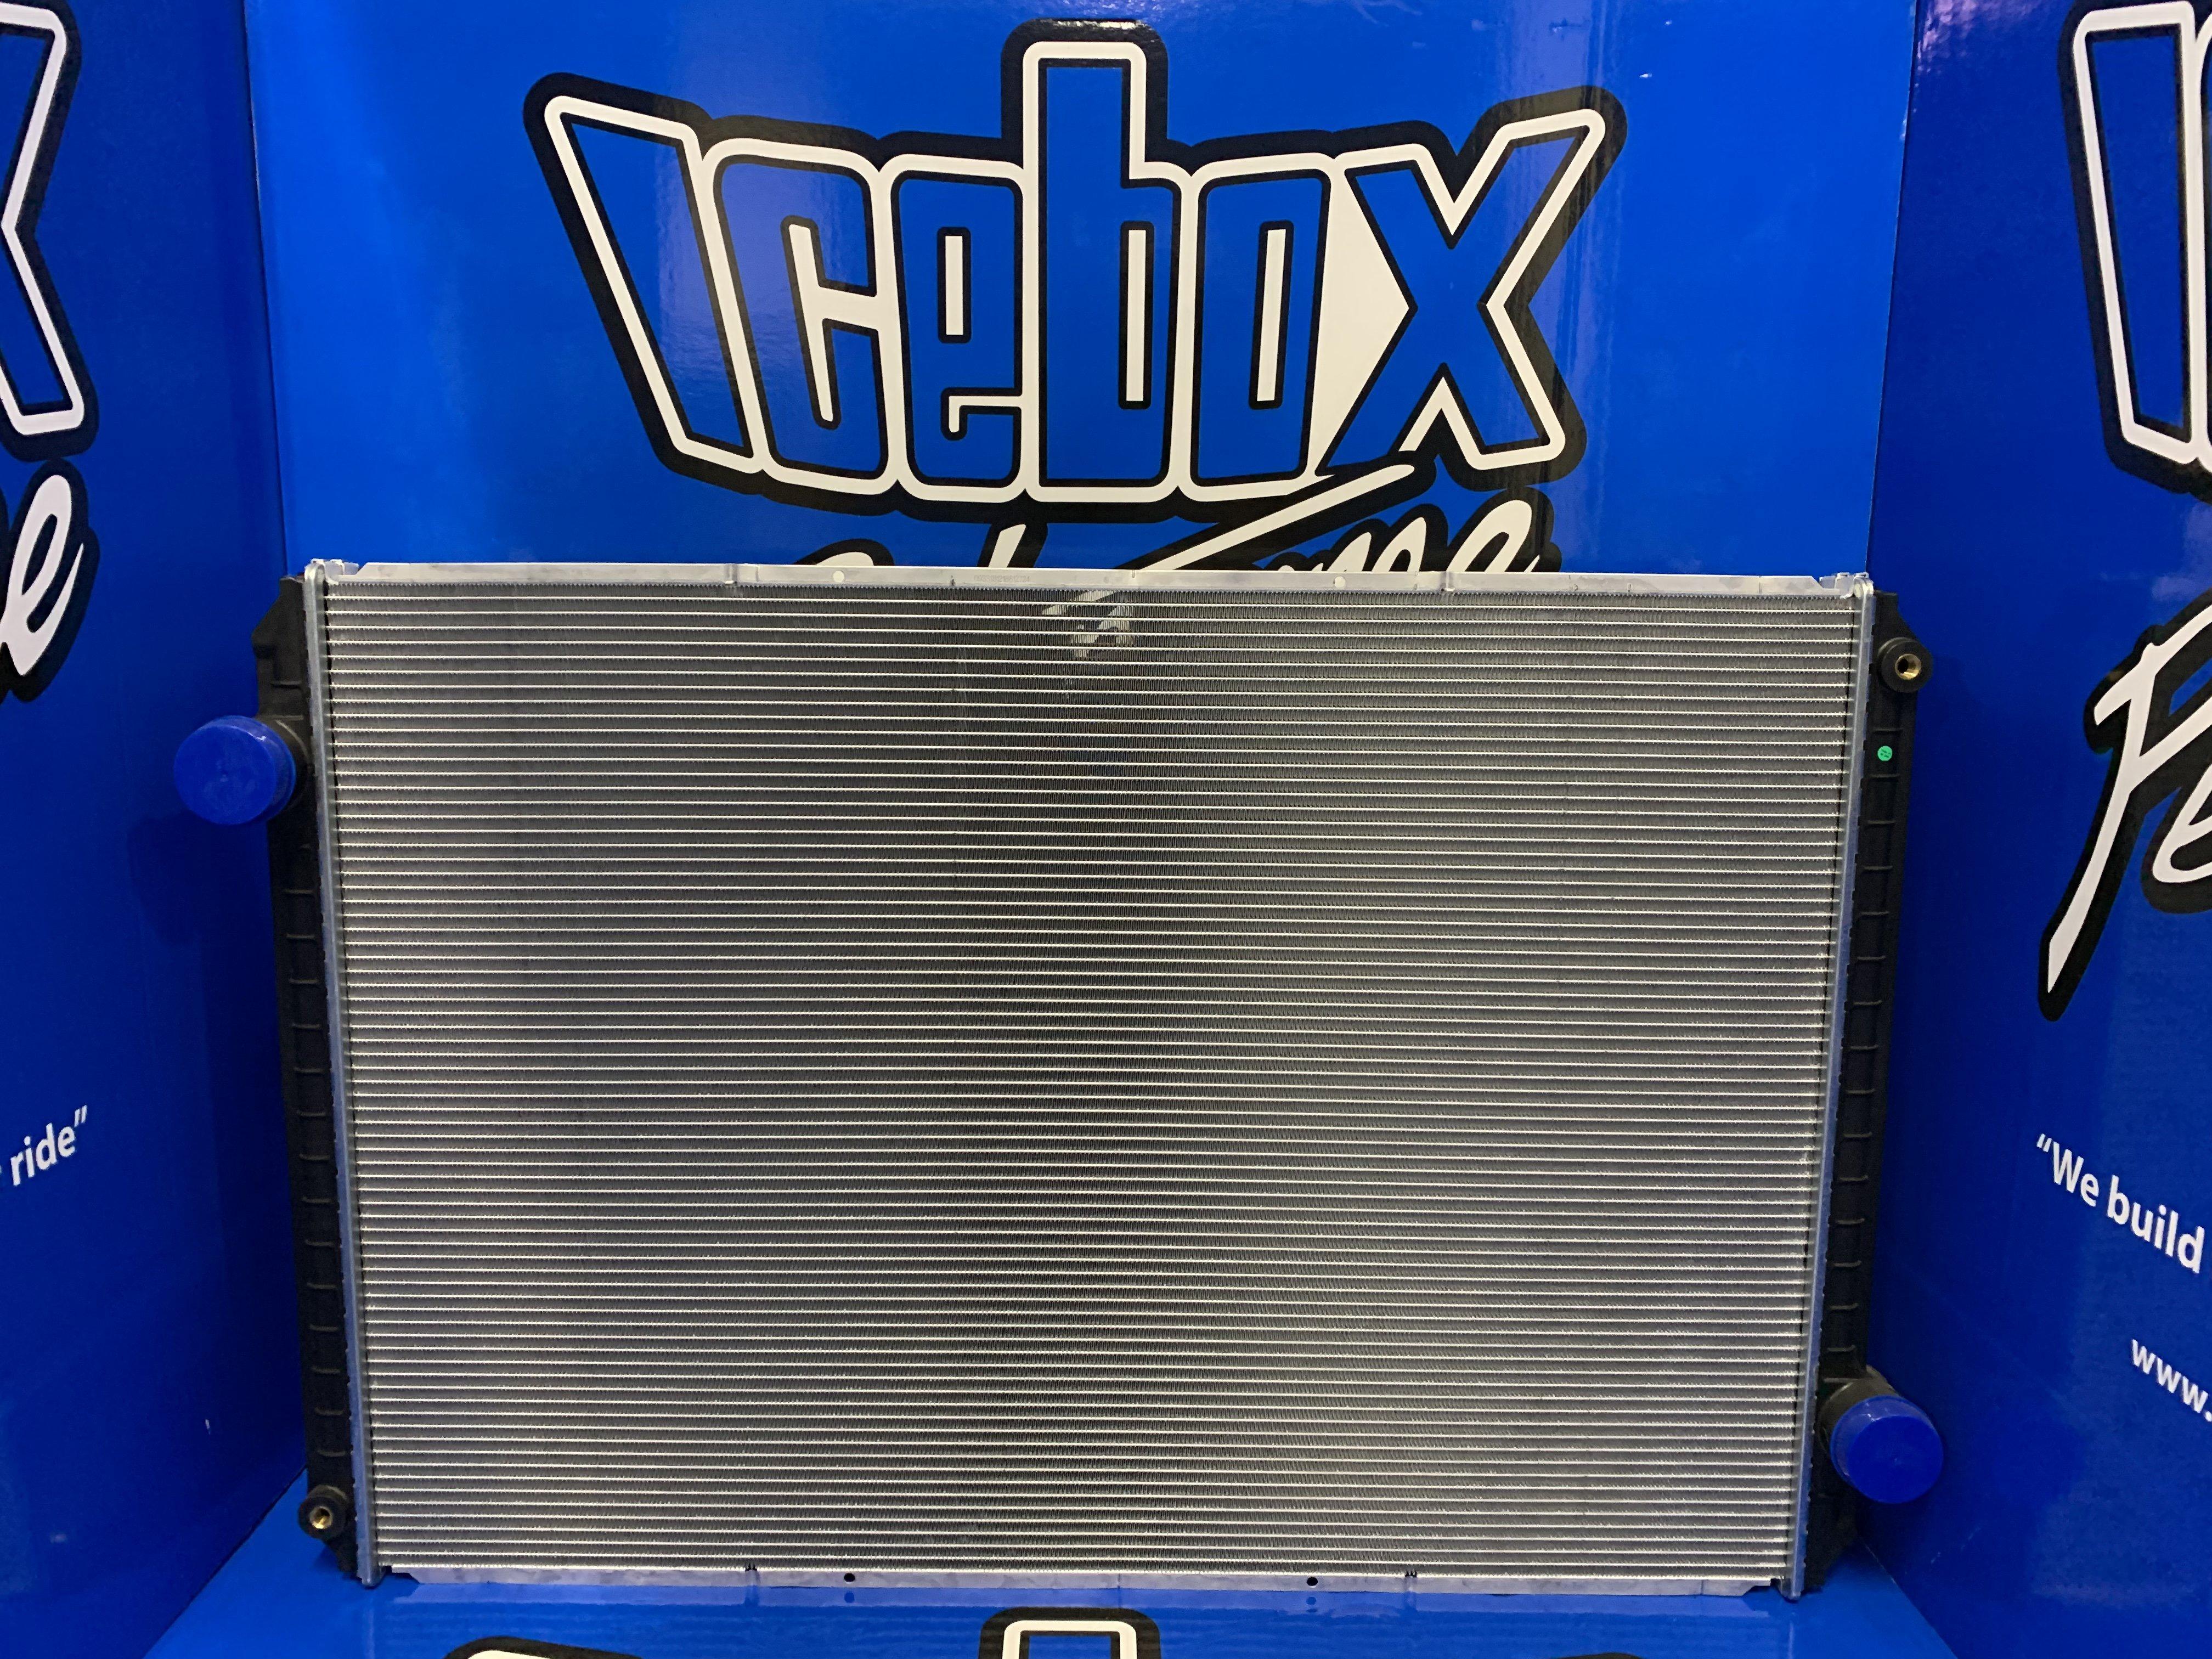 radiator-international-new-part-no-1616363c91-144282-15101364